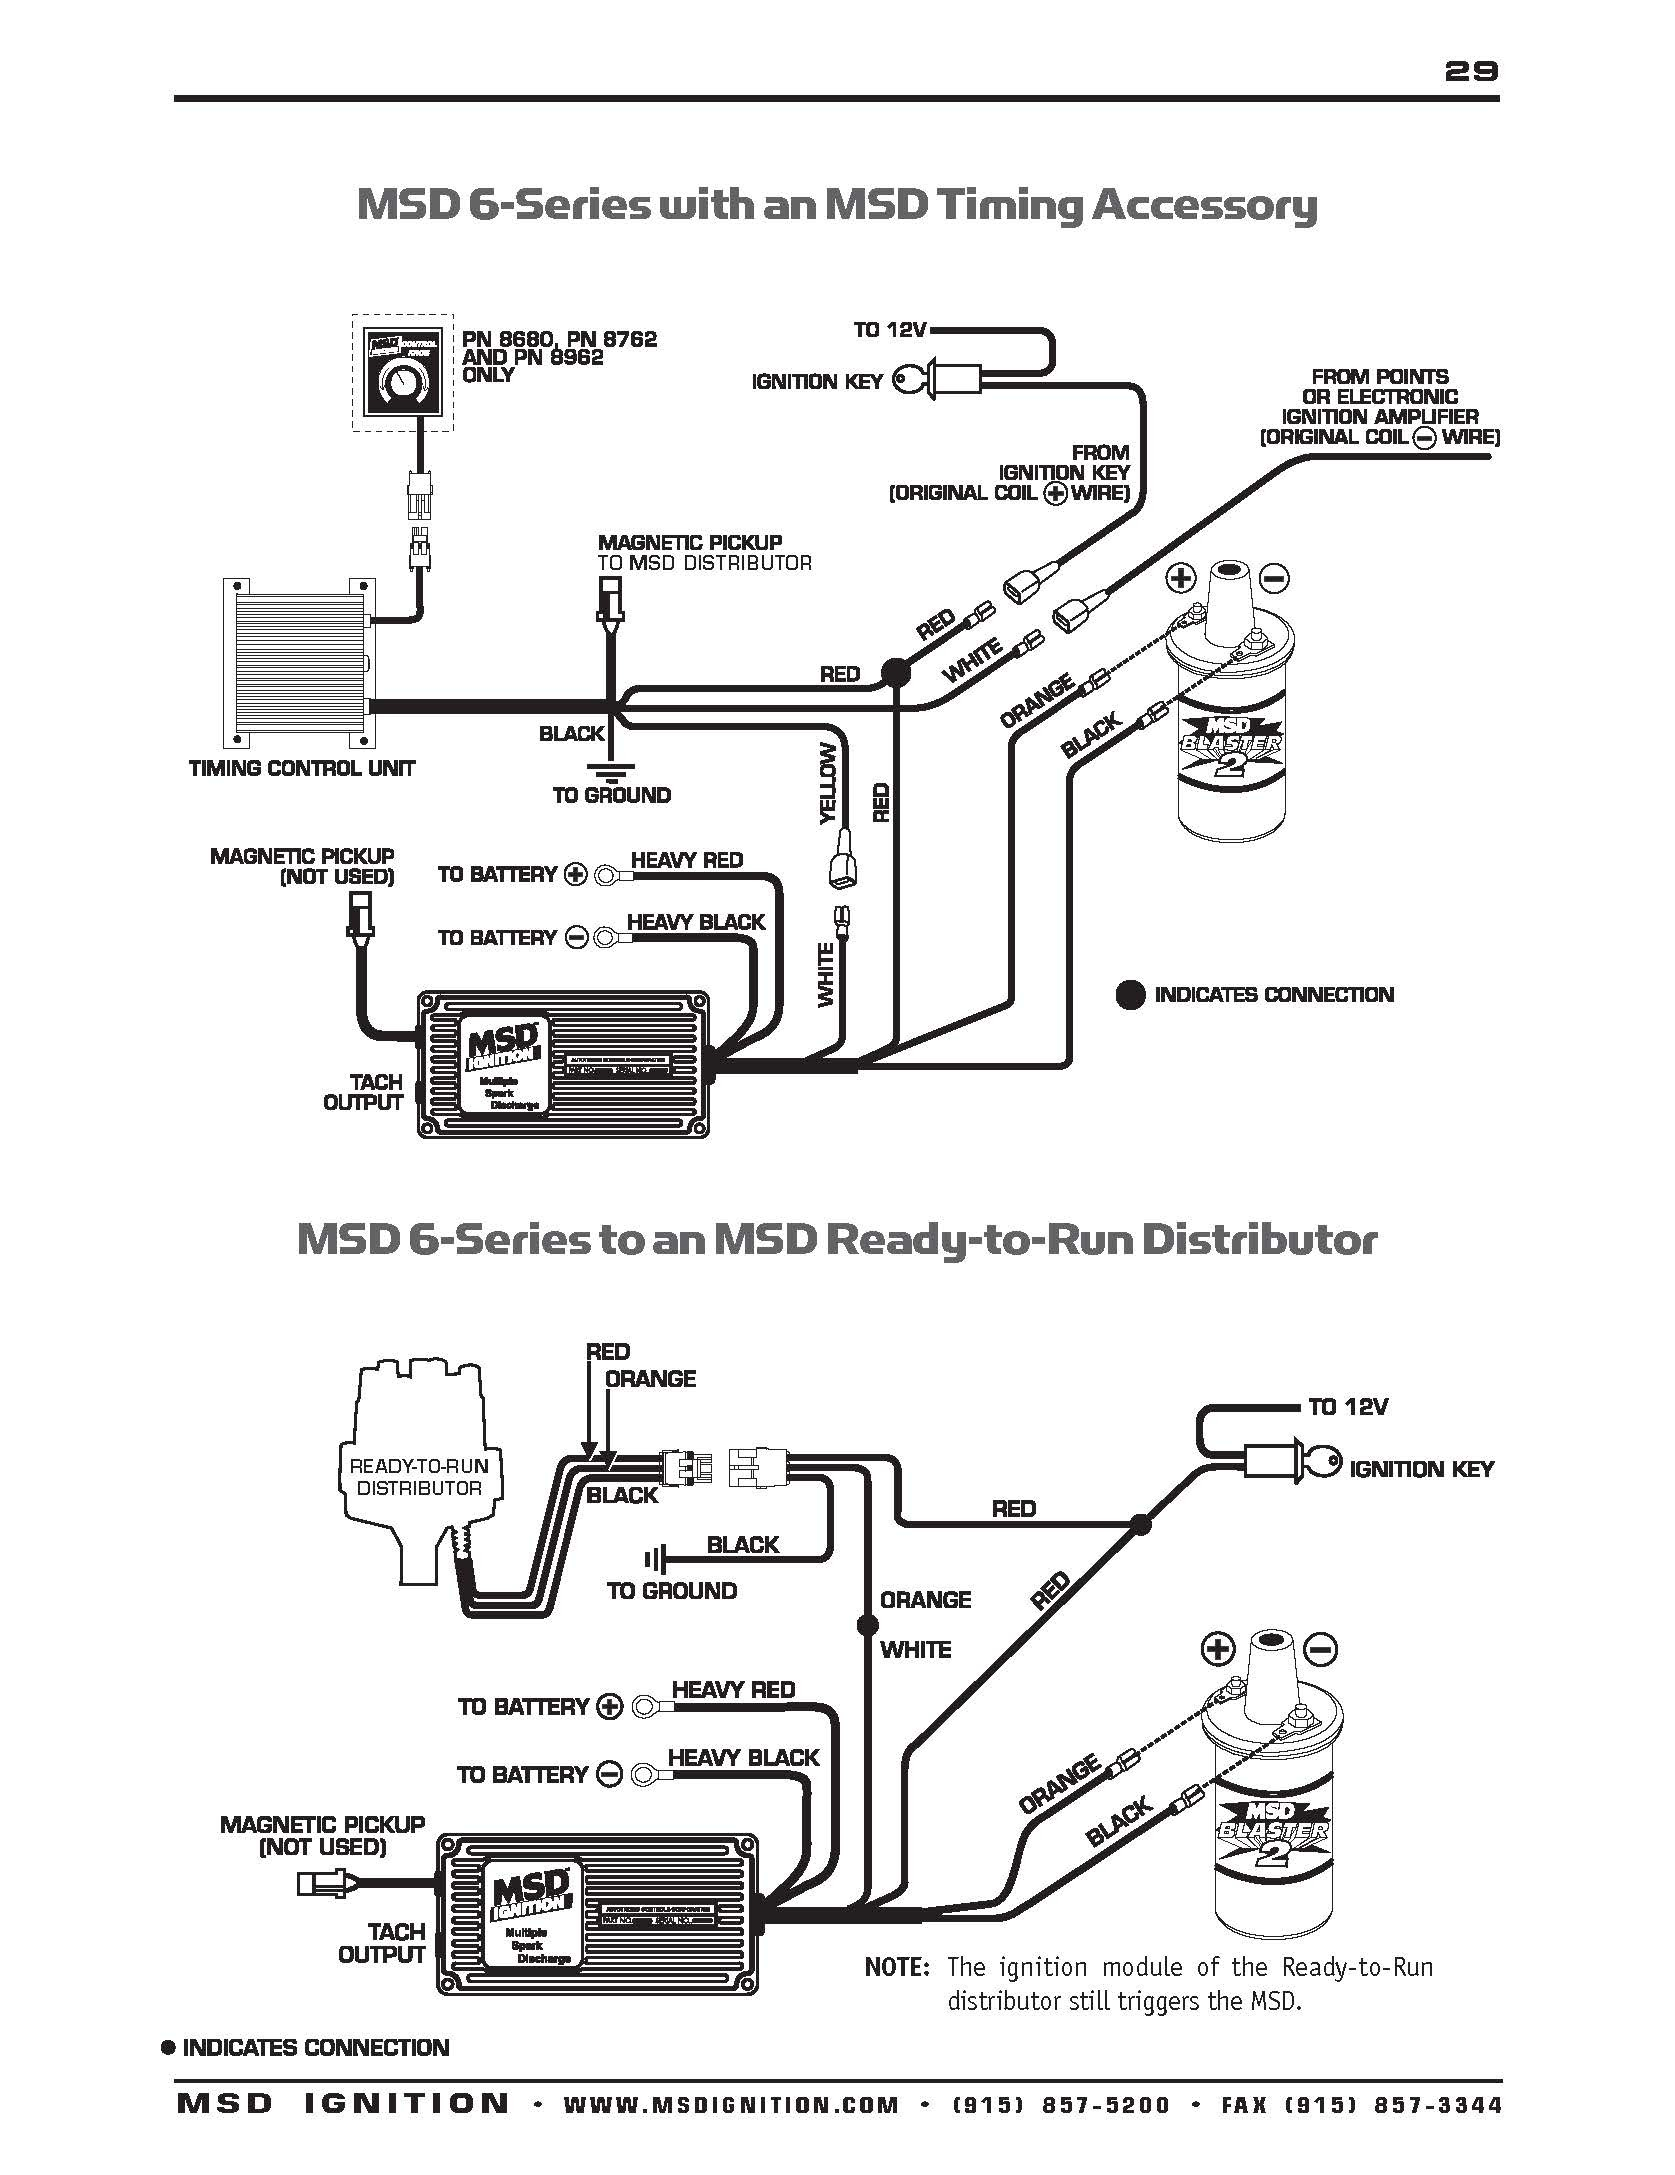 accel 140005 wiring diagram distributor diy wiring diagrams \u2022 nos wiring diagram excel hei distributor wiring diagram wire center u2022 rh mrigroup co accel super coil 140001 wiring diagram accel dfi wiring diagram